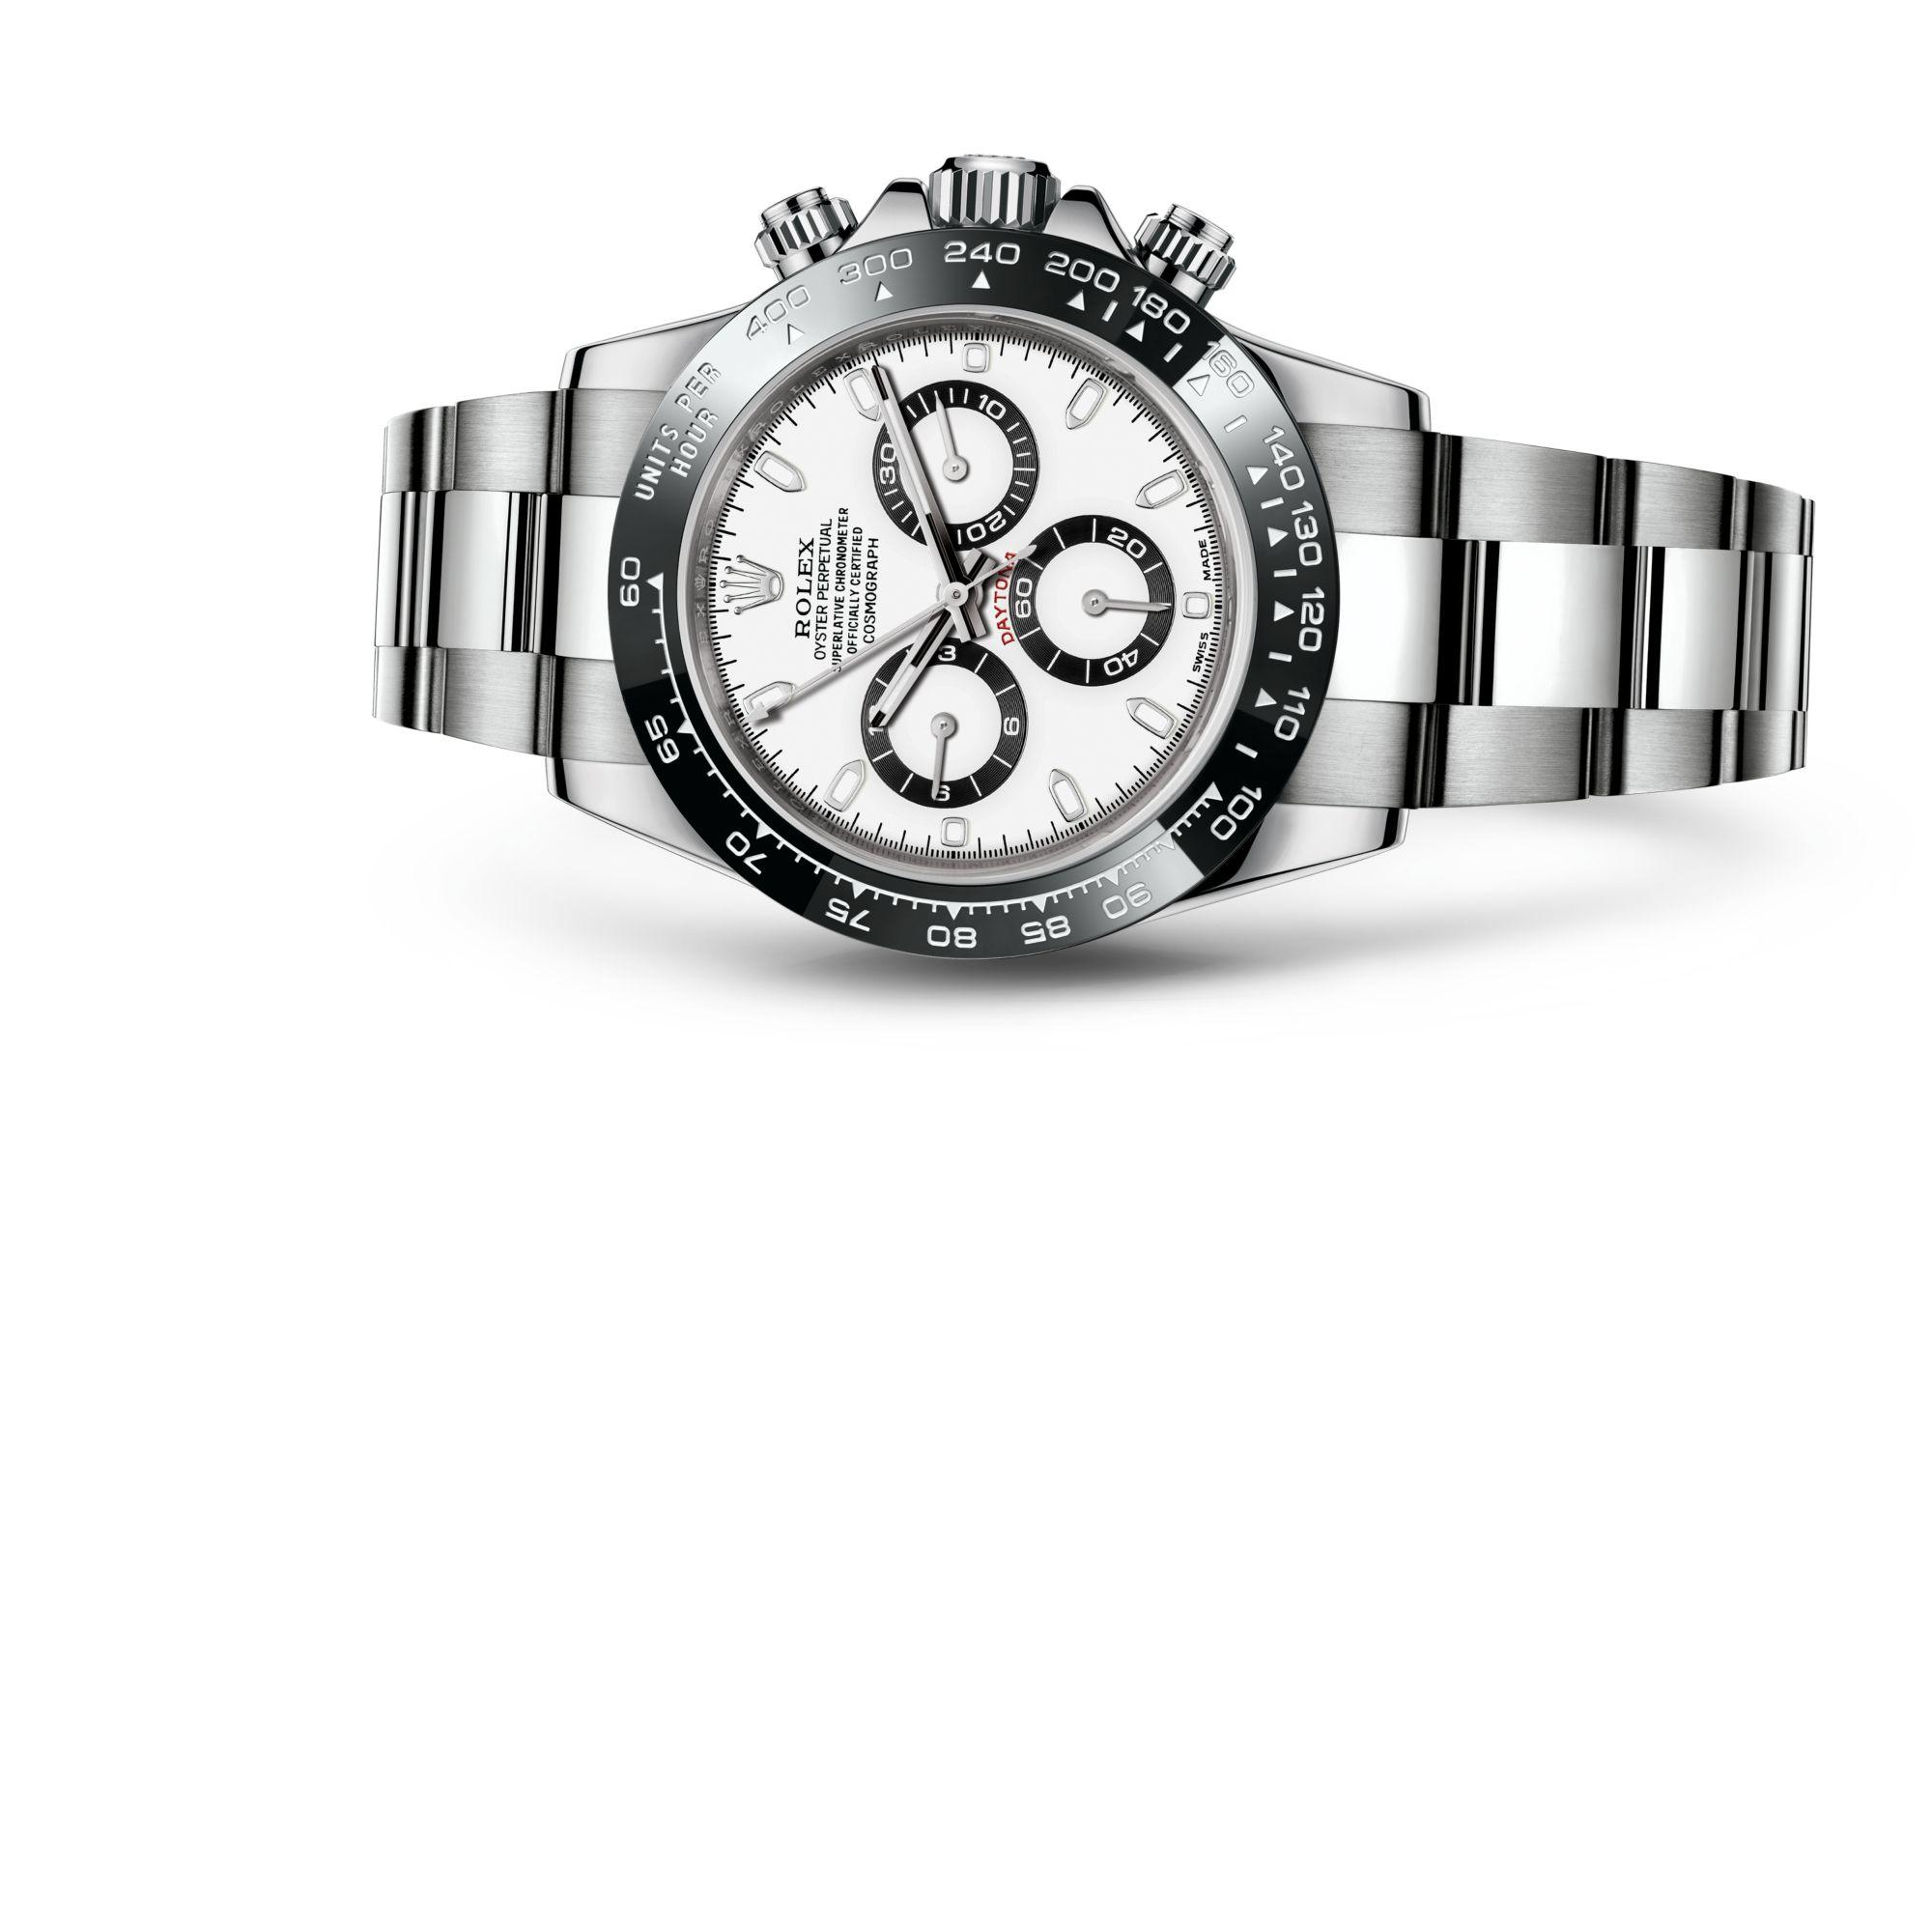 Rolex كوزموغراف دايتونا M116500LN-0001